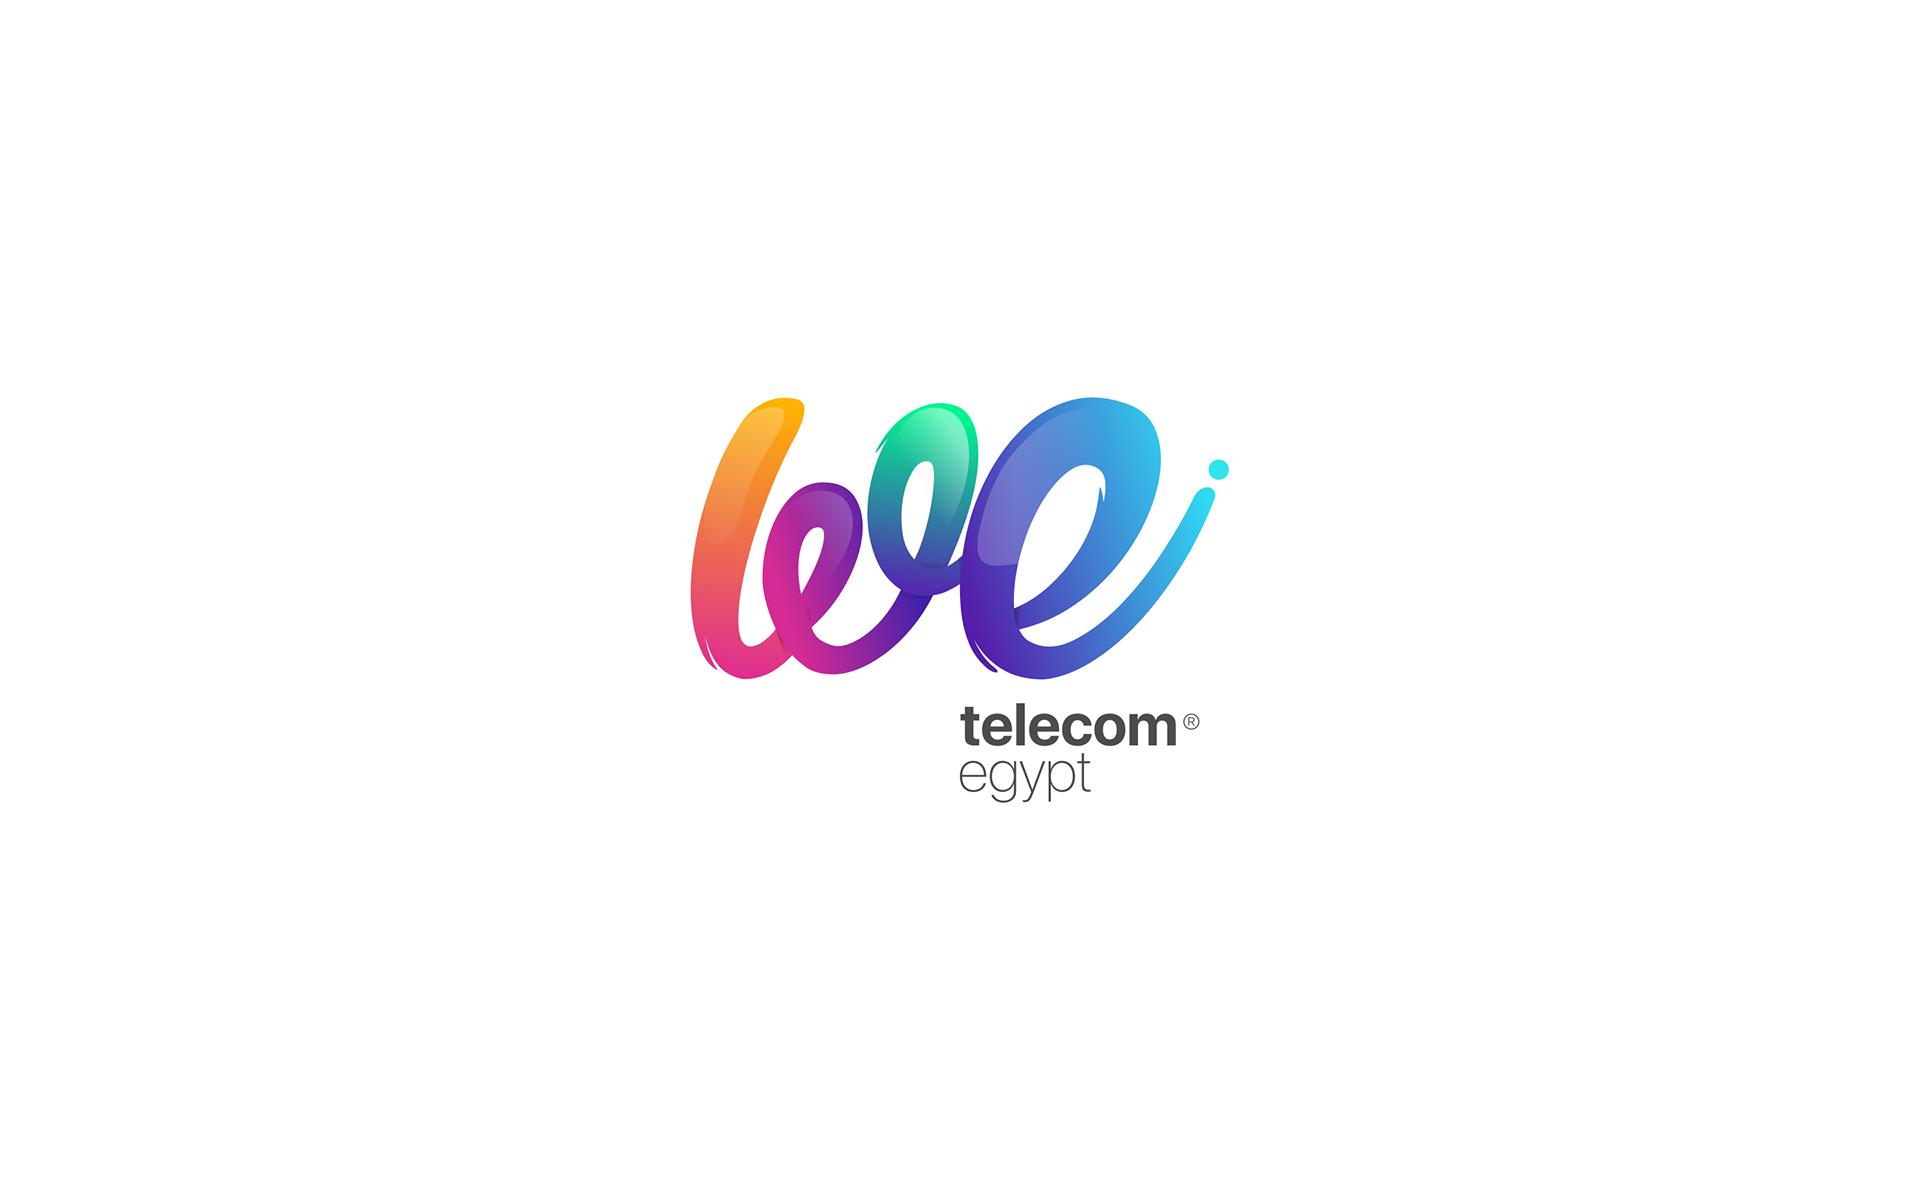 WE-Telecom-Egypt-nding-Concept Espn Letter Logo Template on bing letter templates, google letter templates, microsoft letter templates,